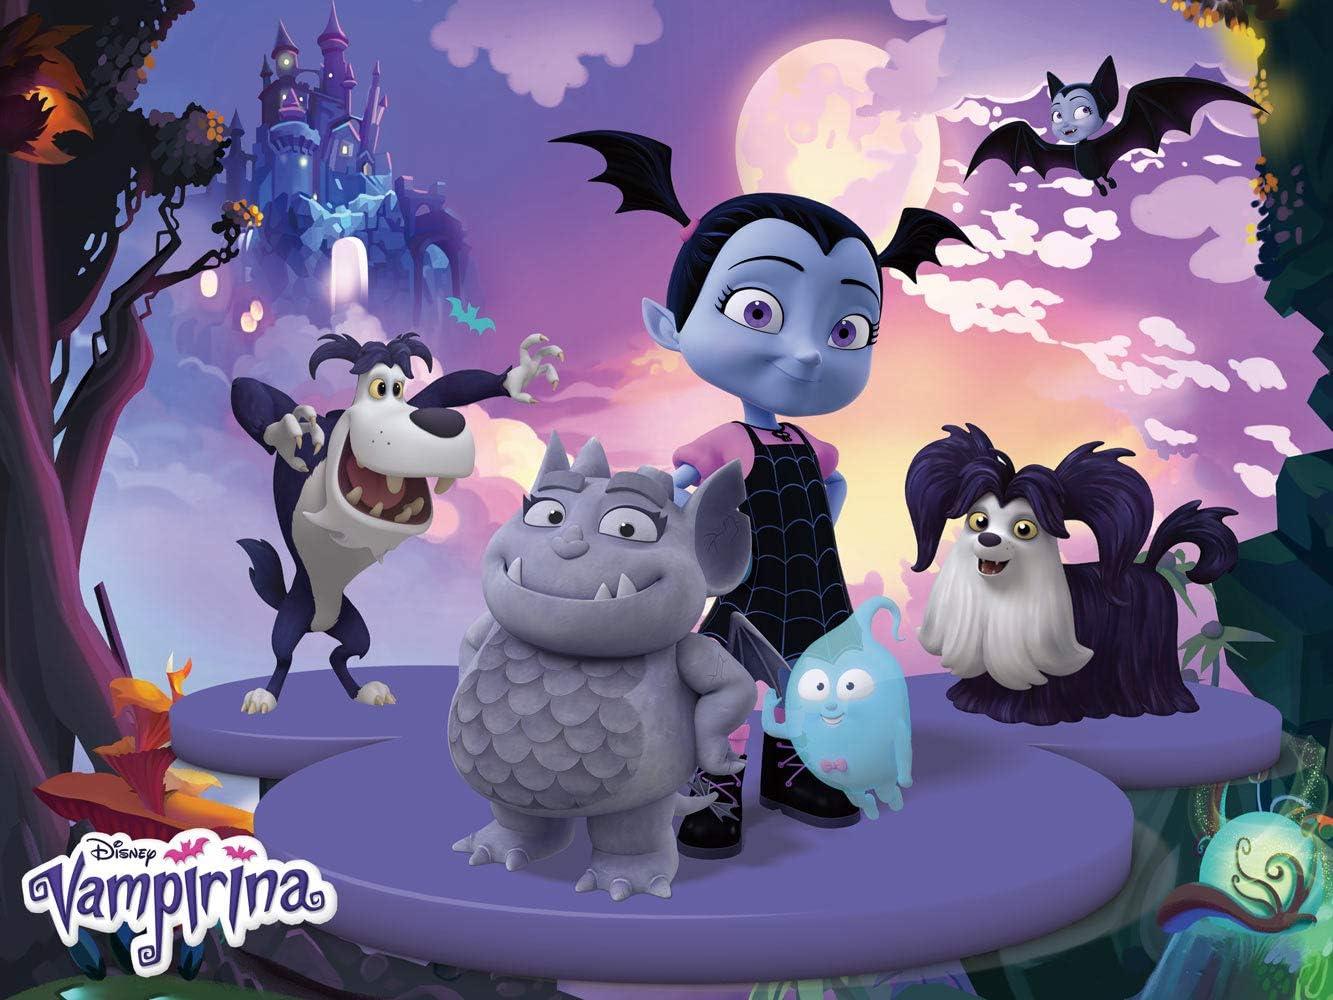 vampirina party photo inspiration